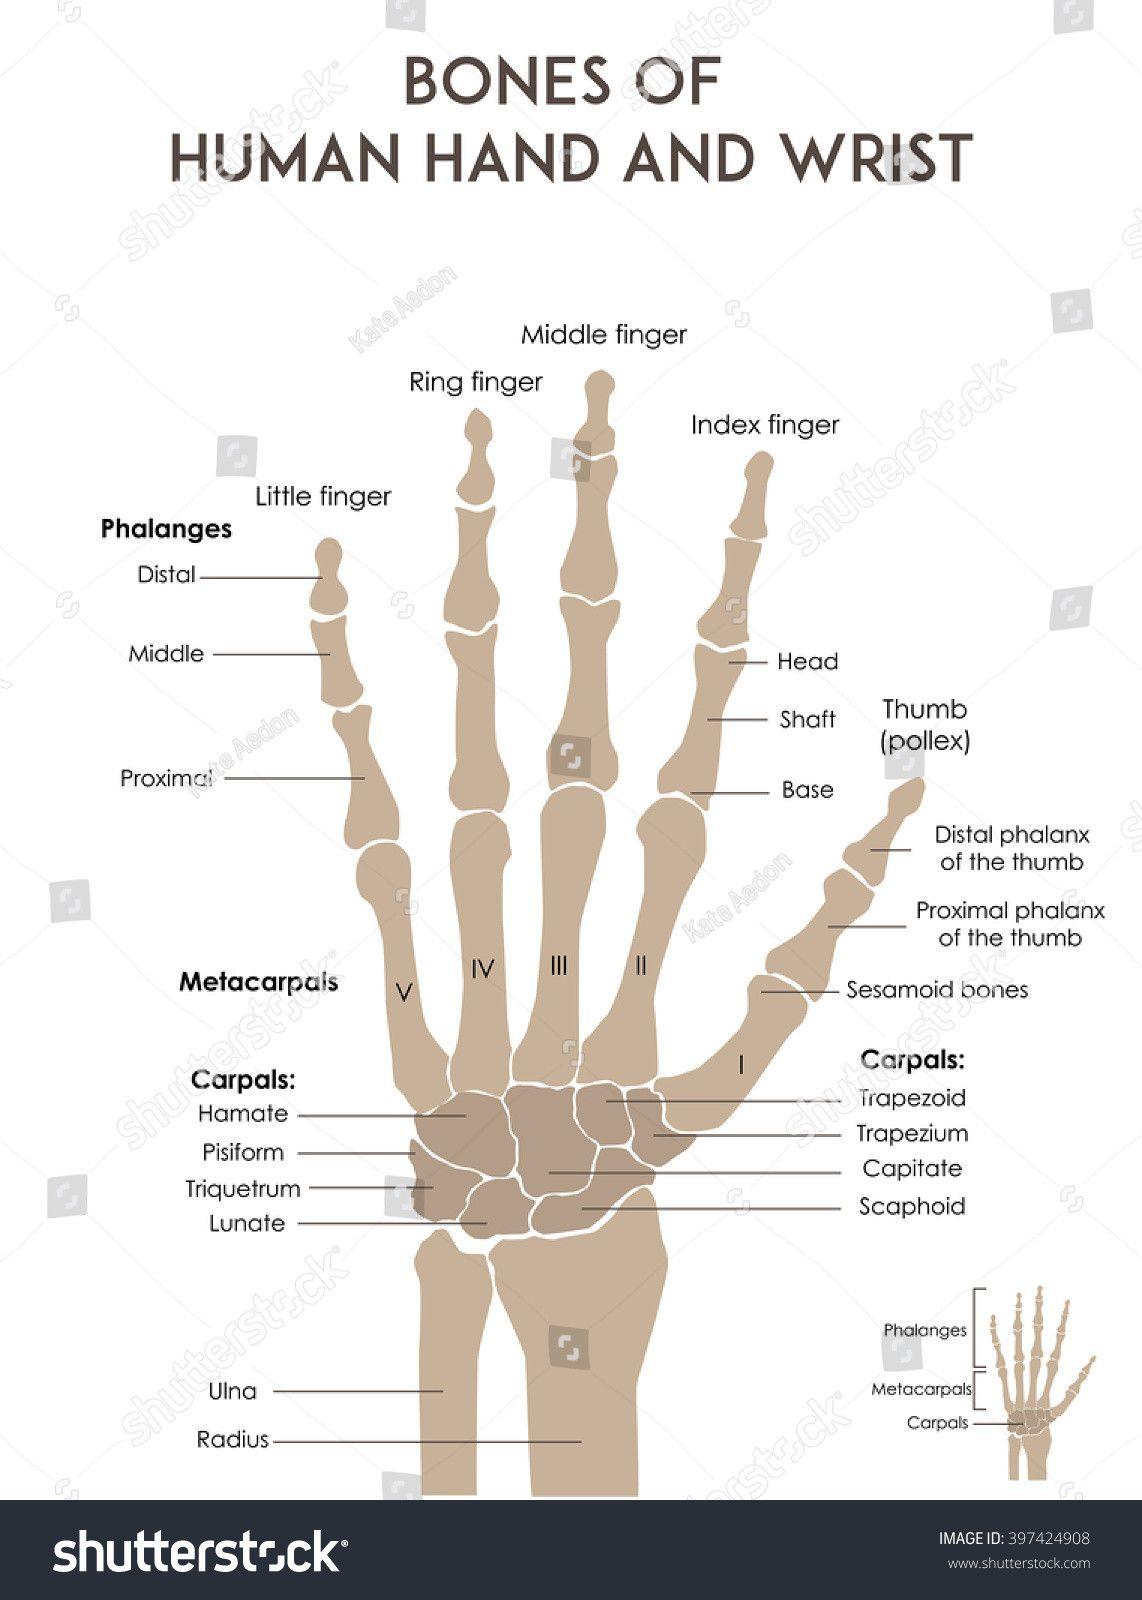 Bones Of The Hand Labeled Fresh Bones Human Hand And Wrist